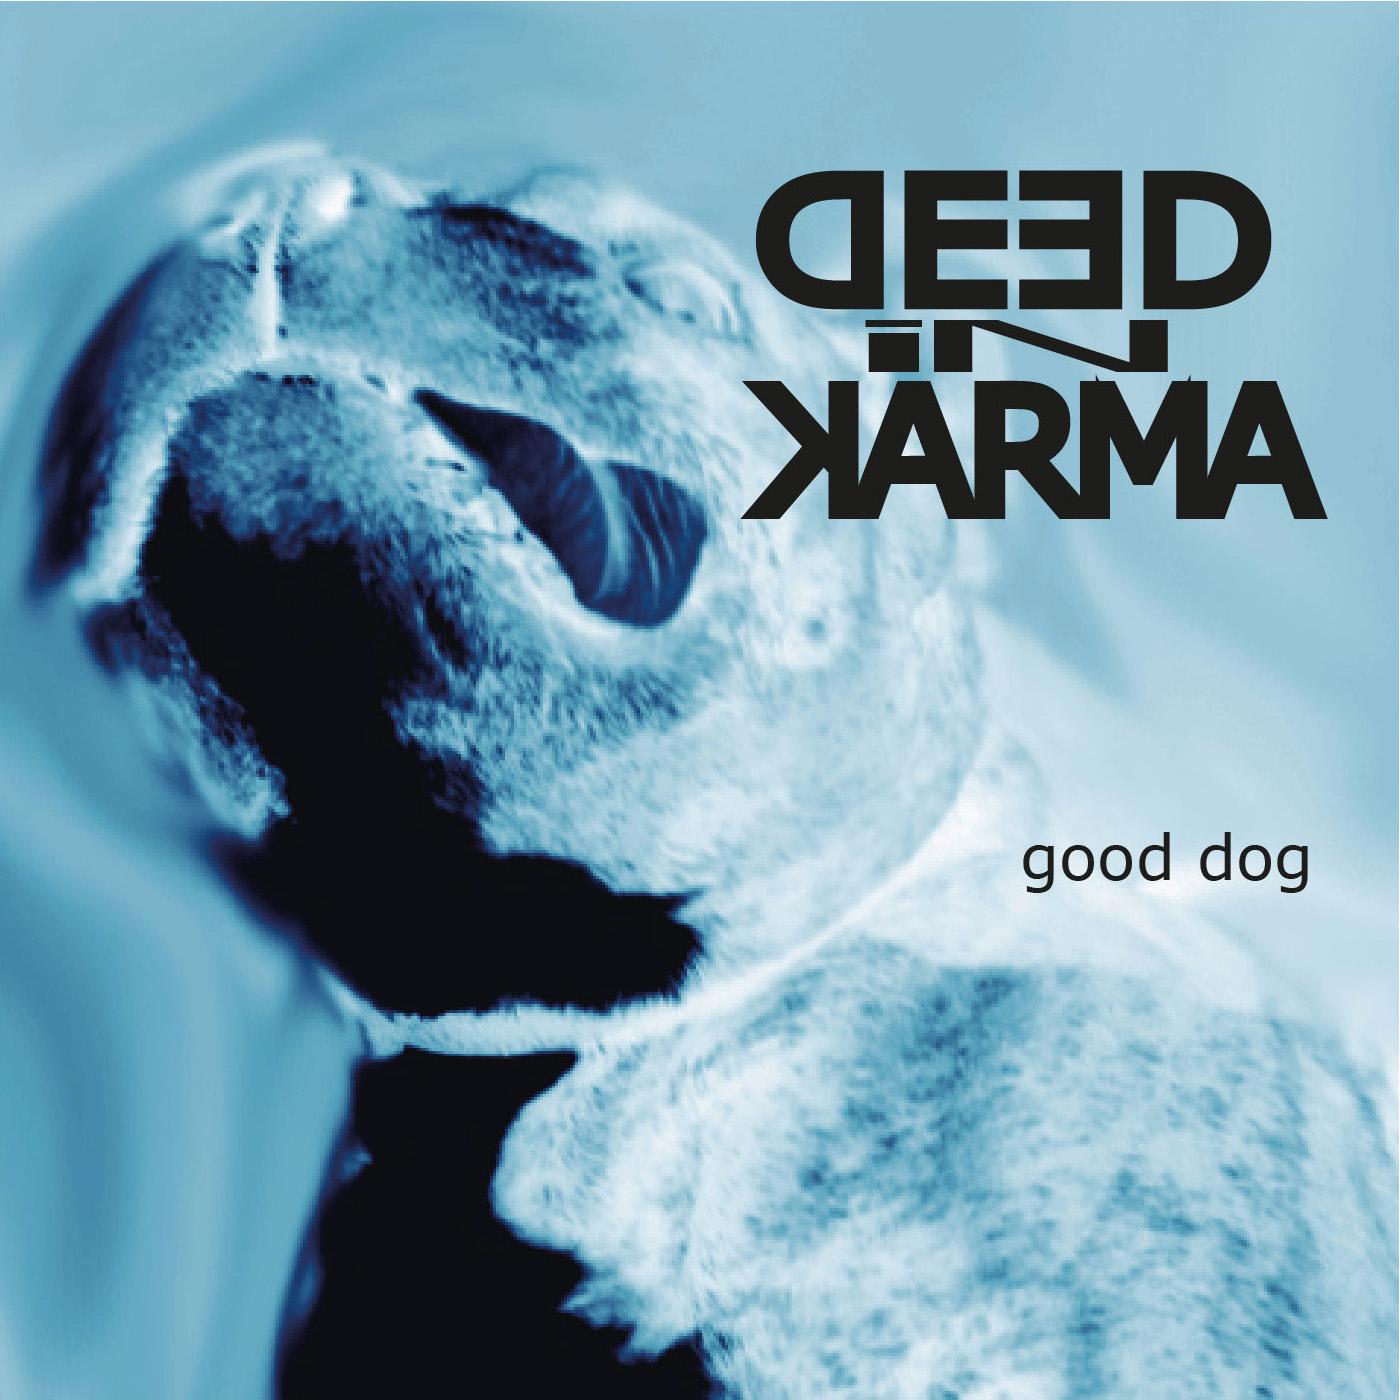 Album Review: DEED IN KARMA – Alex Alicia Media